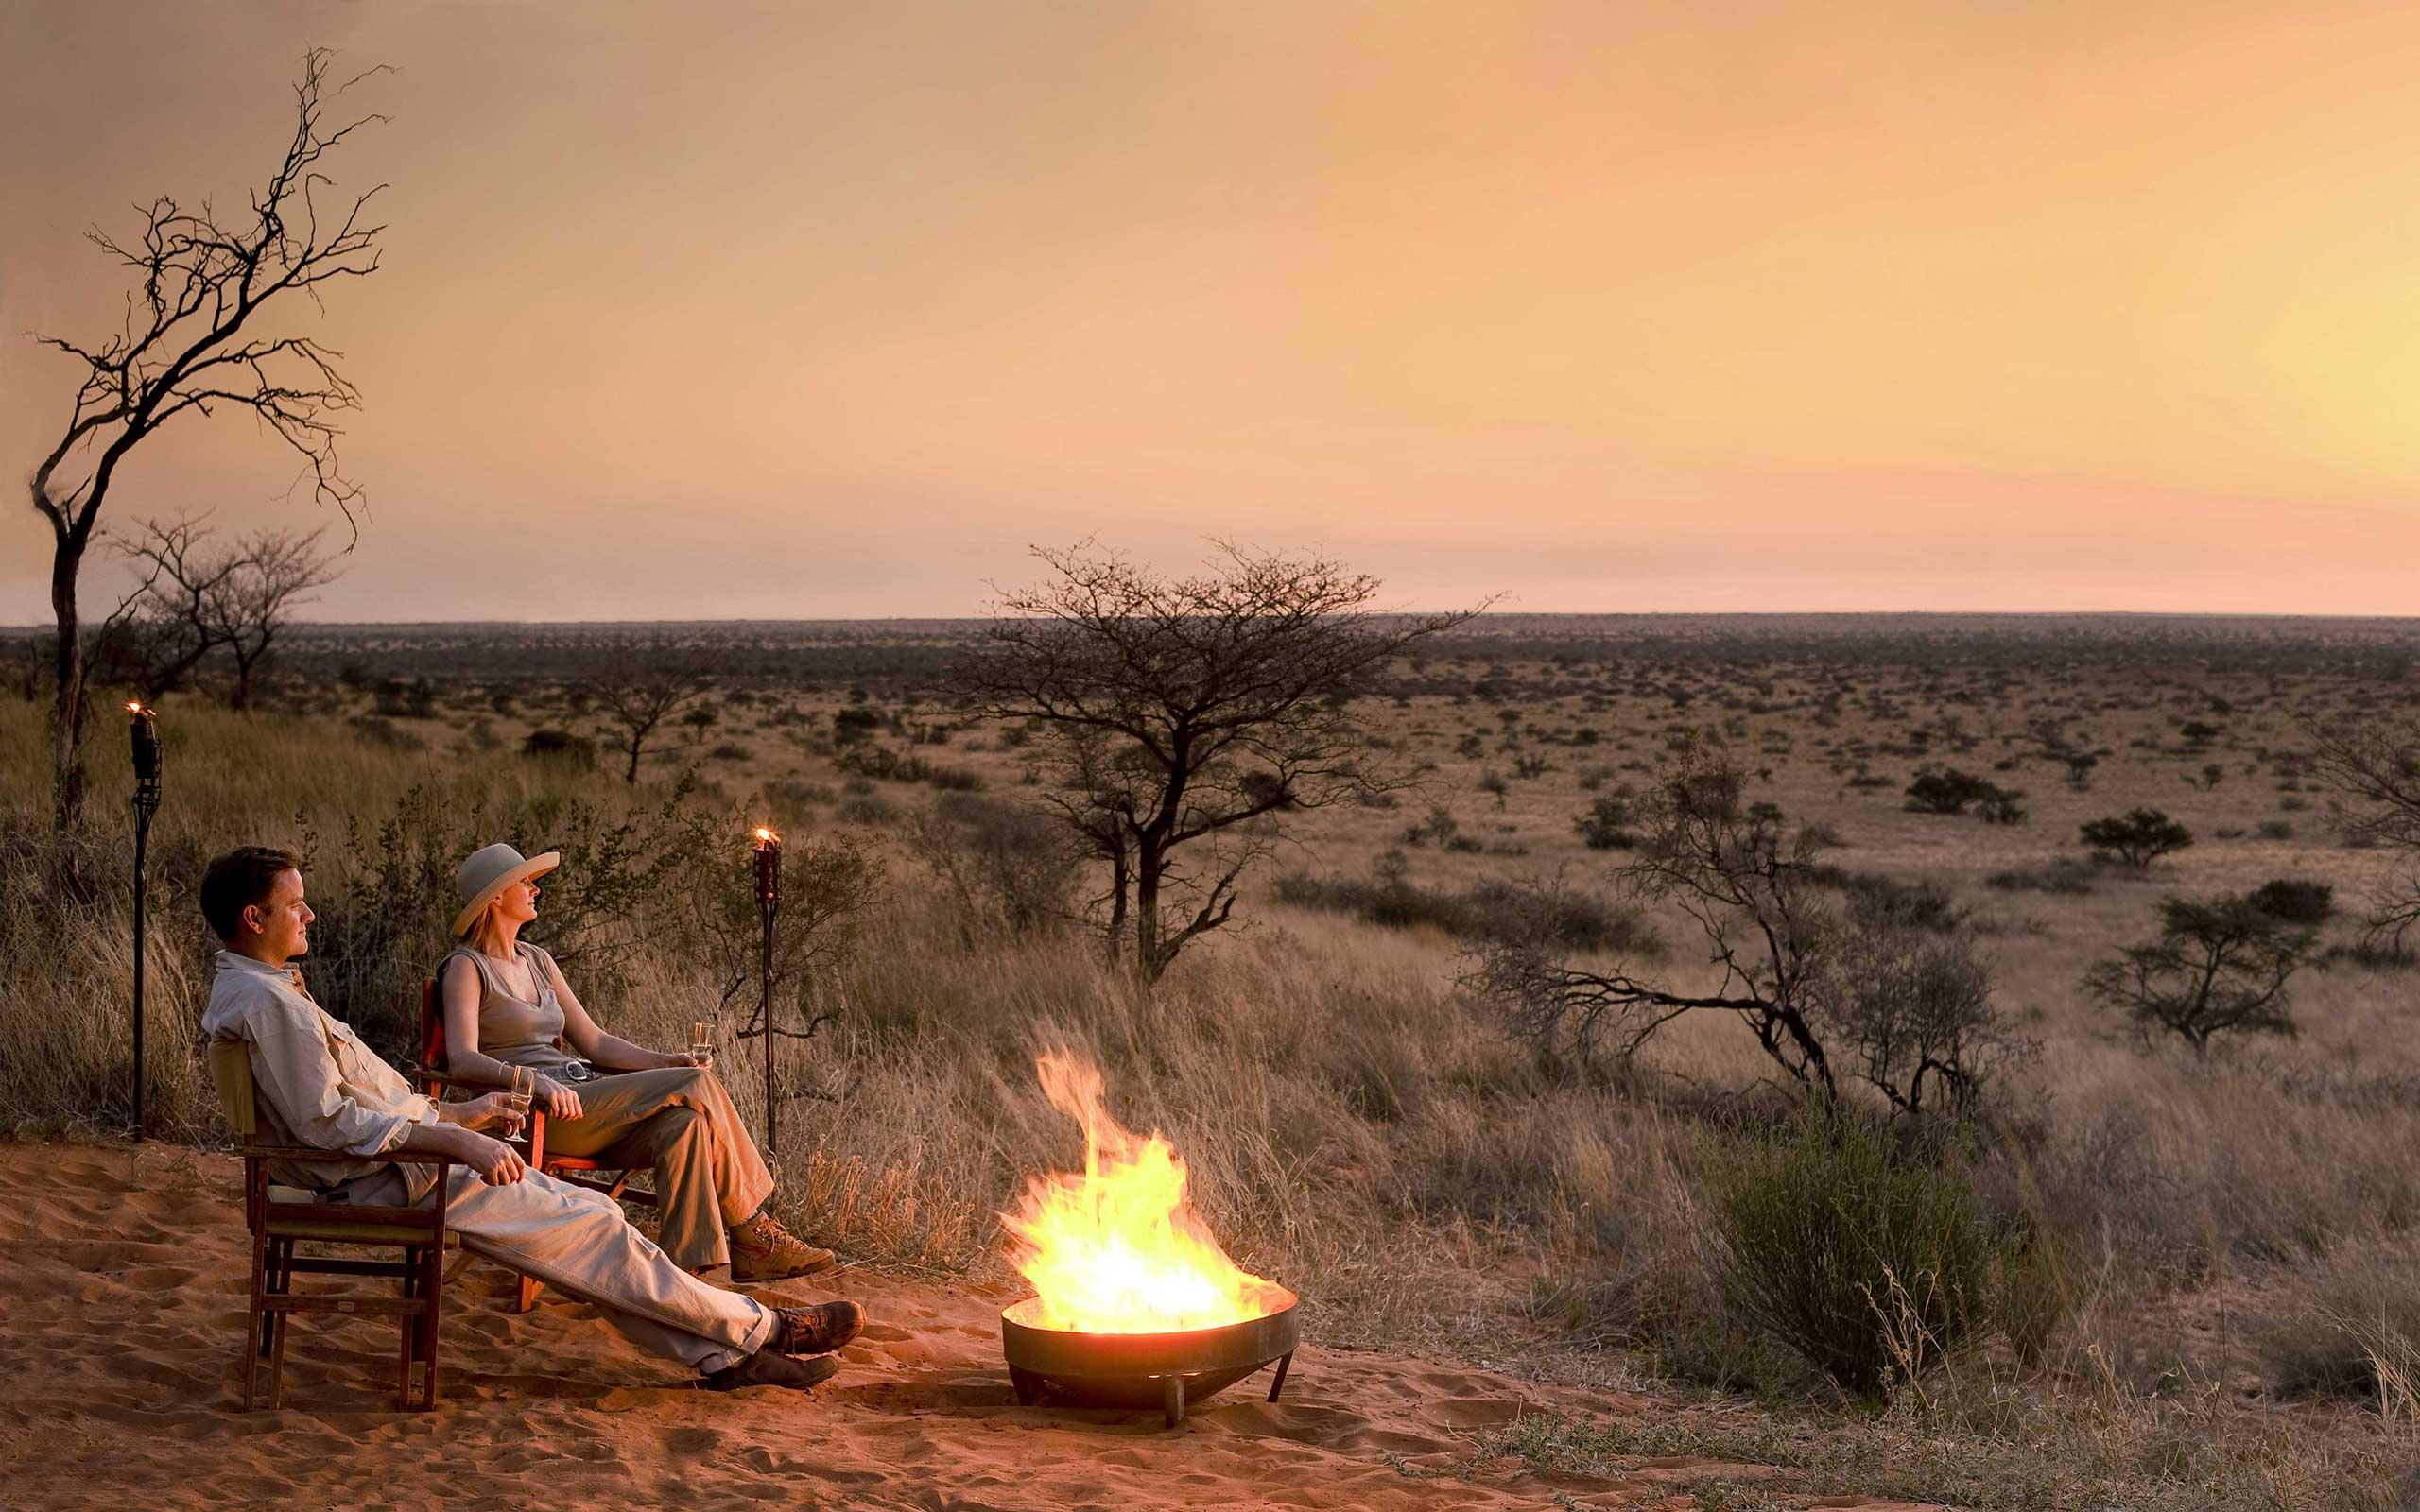 tswalu-the-motse-kalahari-south-africa-enkosi